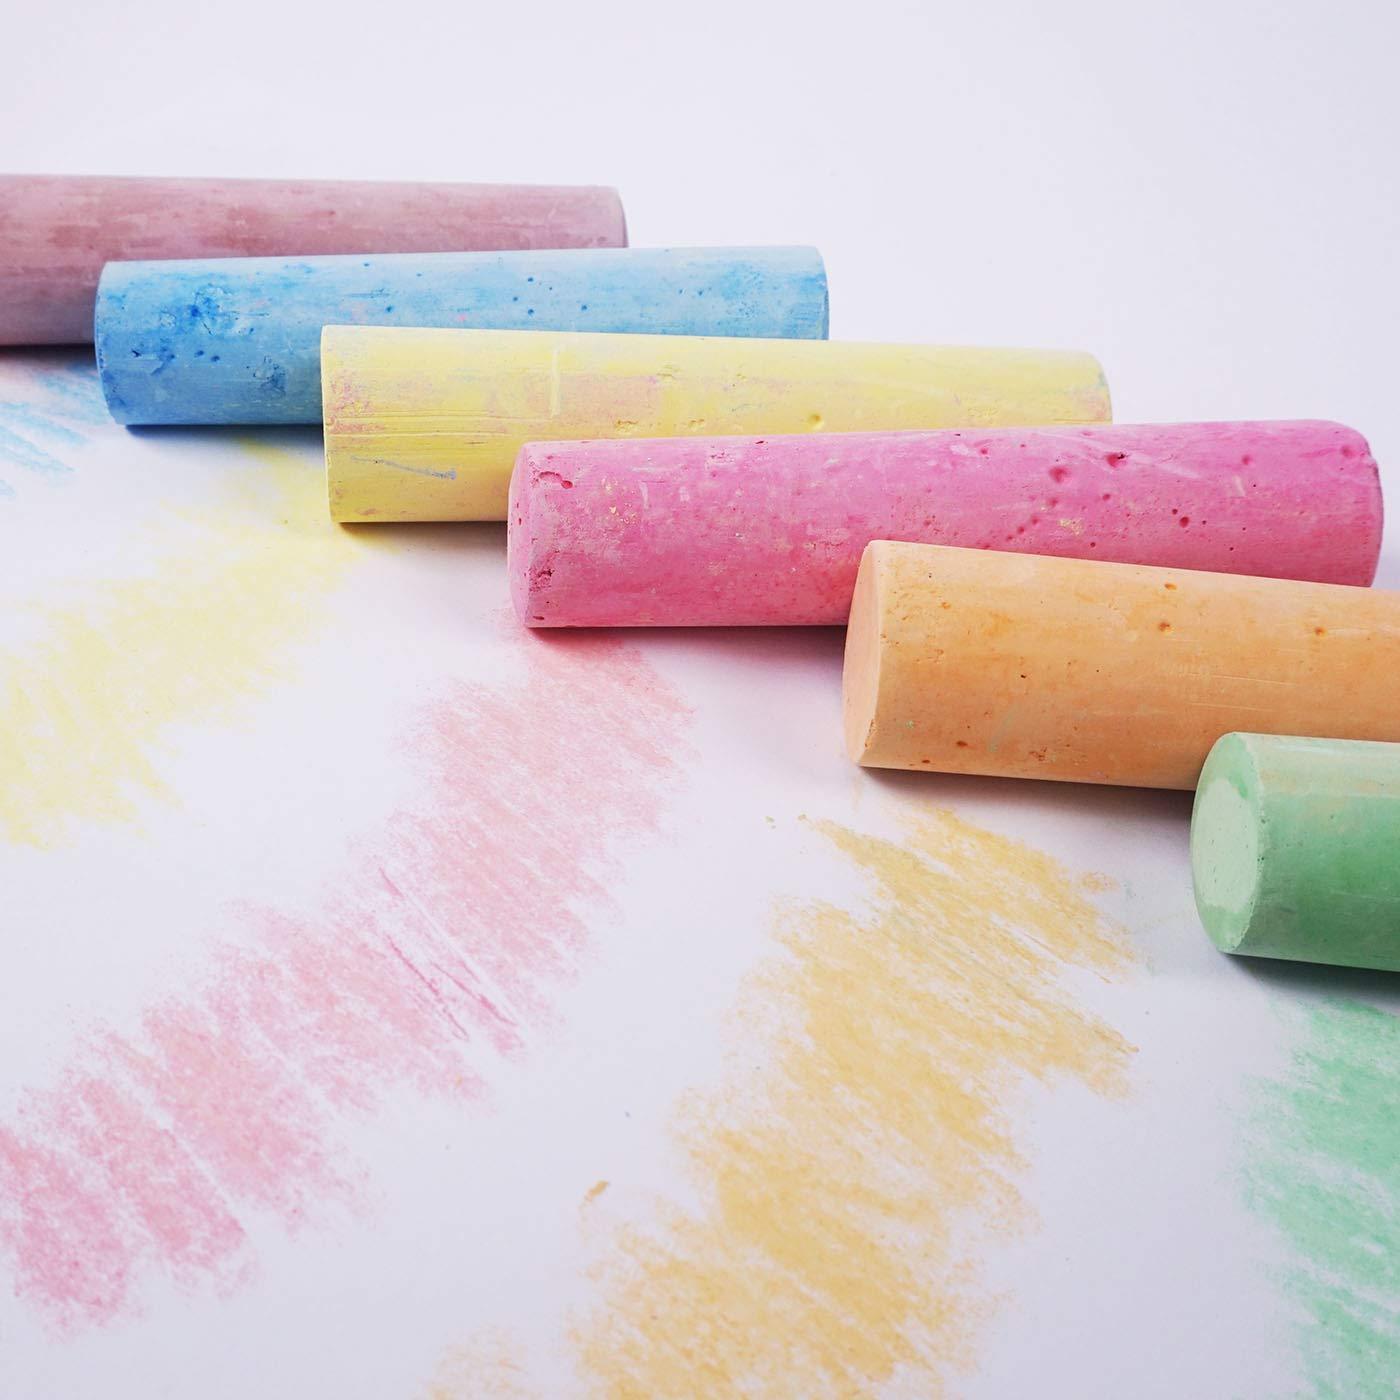 12 Pack Artbox Giant Pavement Chalks Pavement Art Coloured Floor Games Board